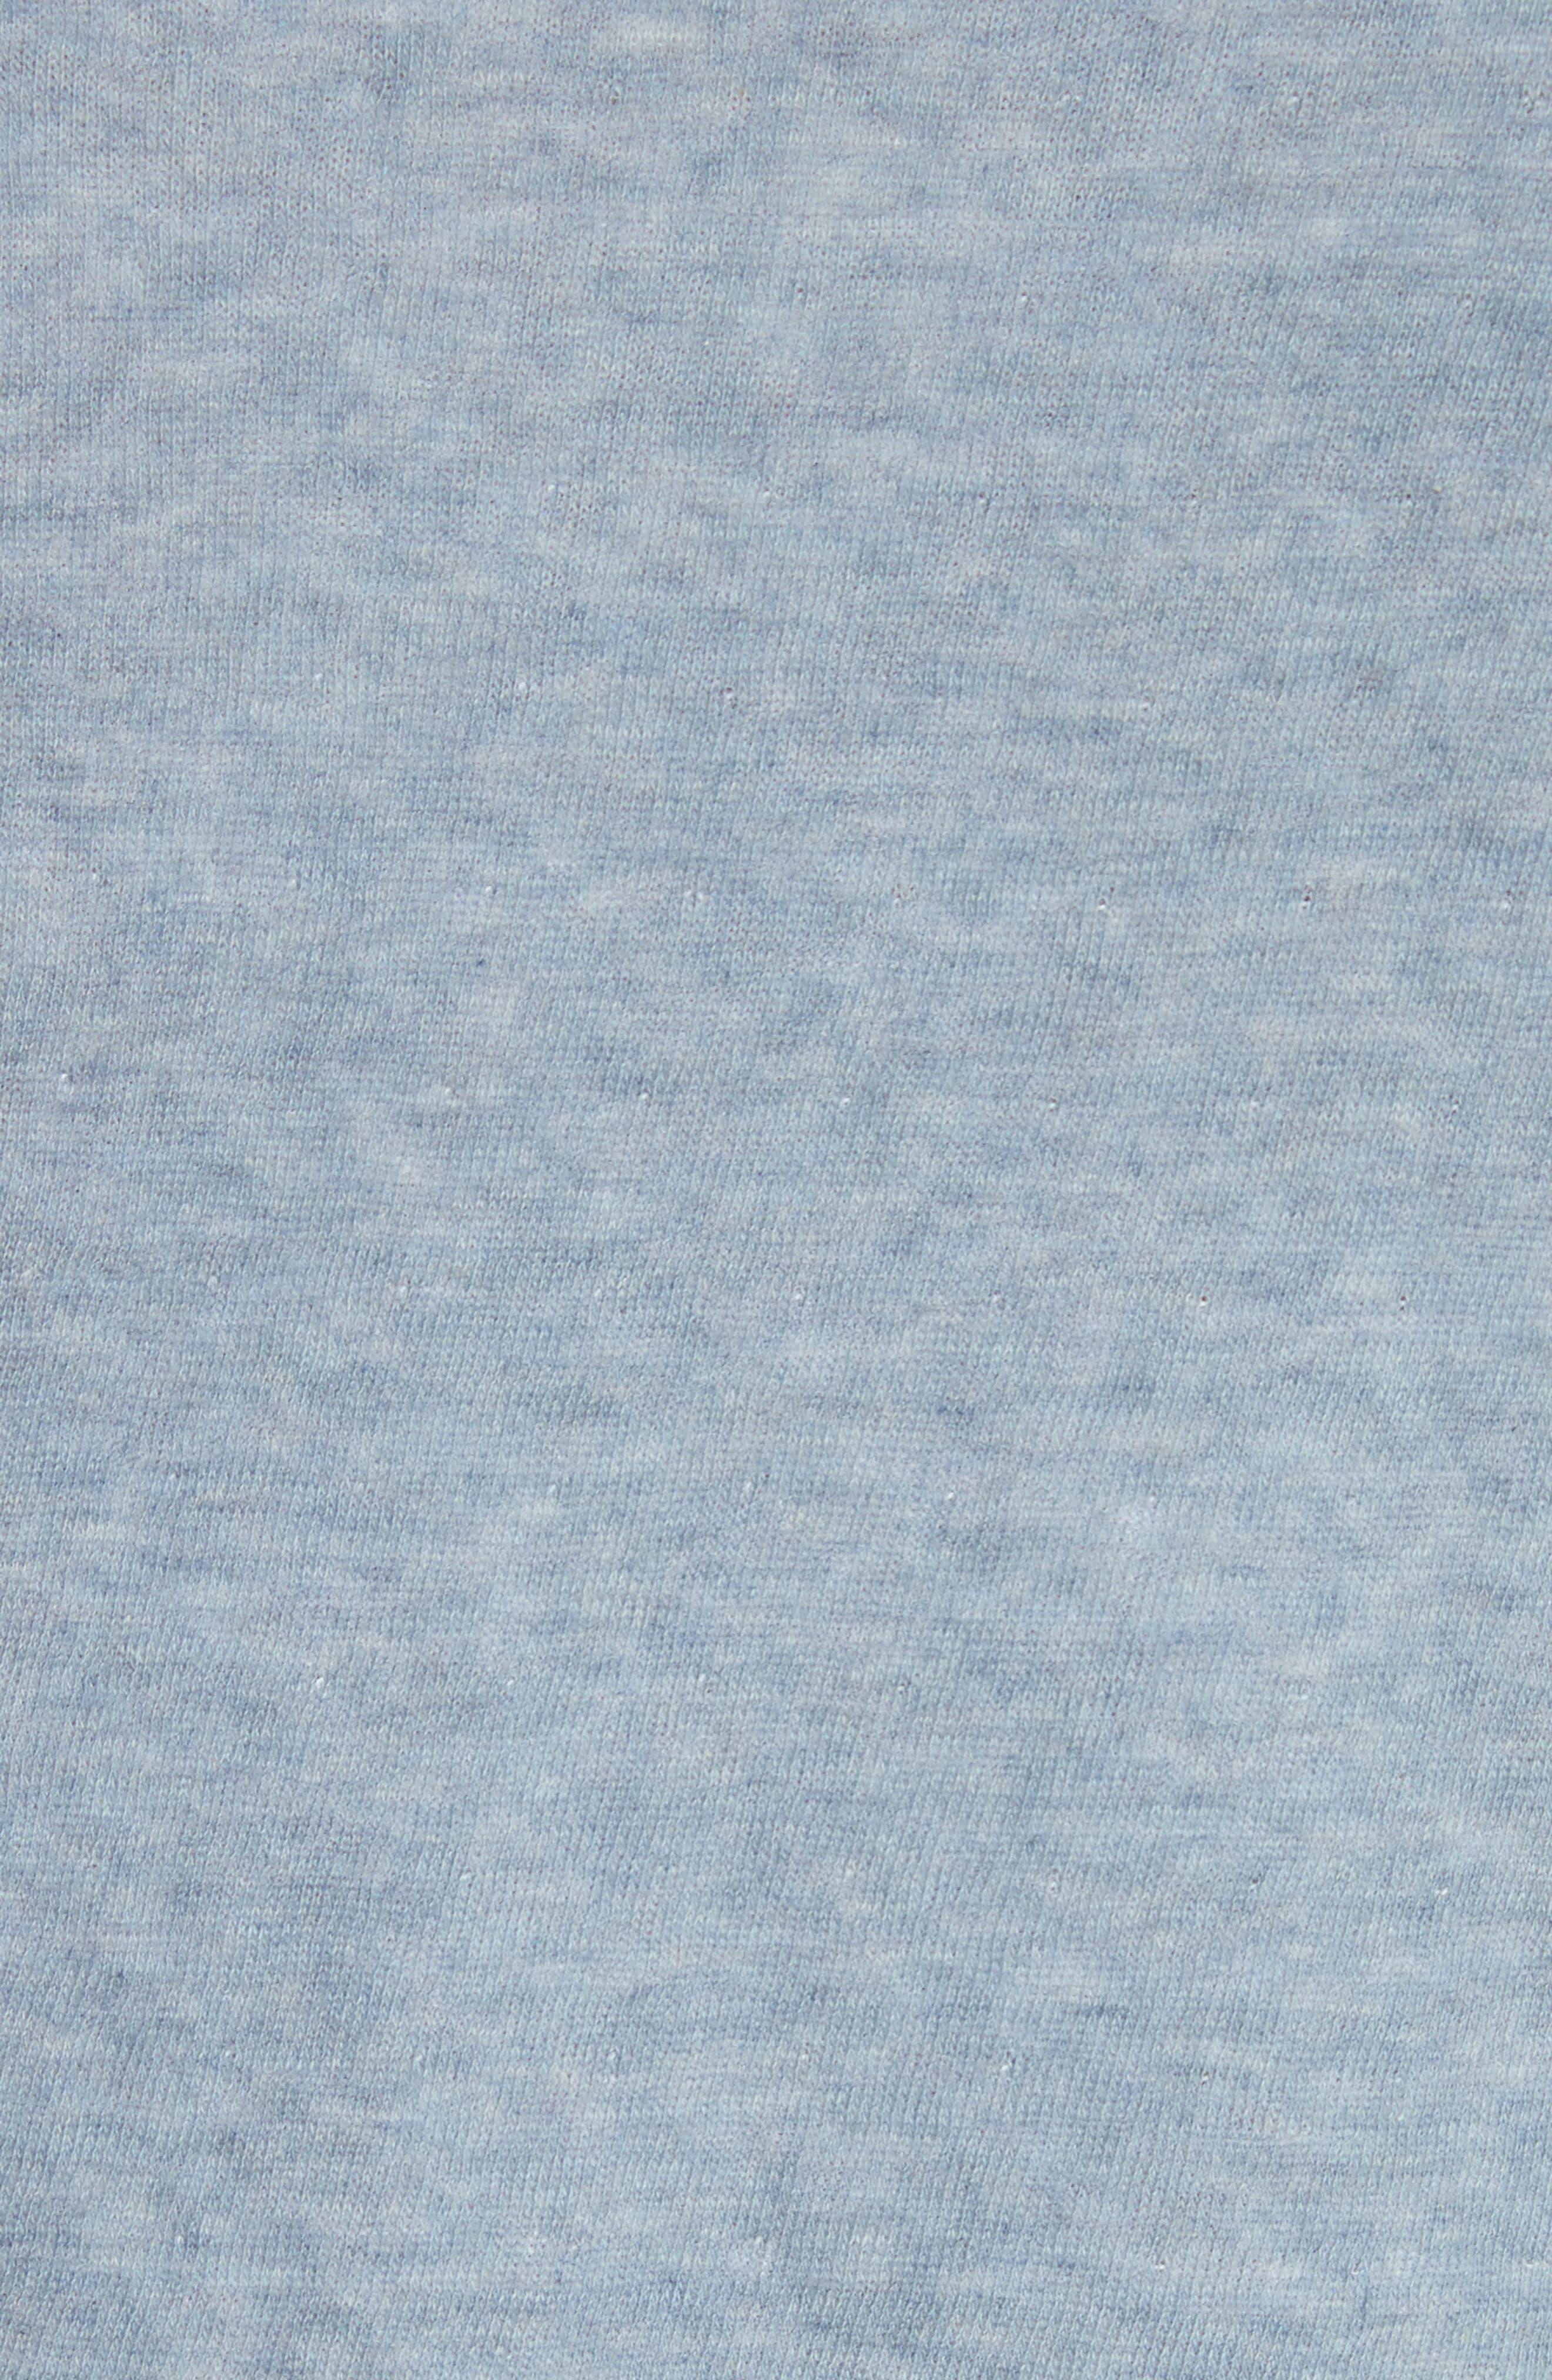 Tripp Pocket T-Shirt,                             Alternate thumbnail 5, color,                             Light Blue